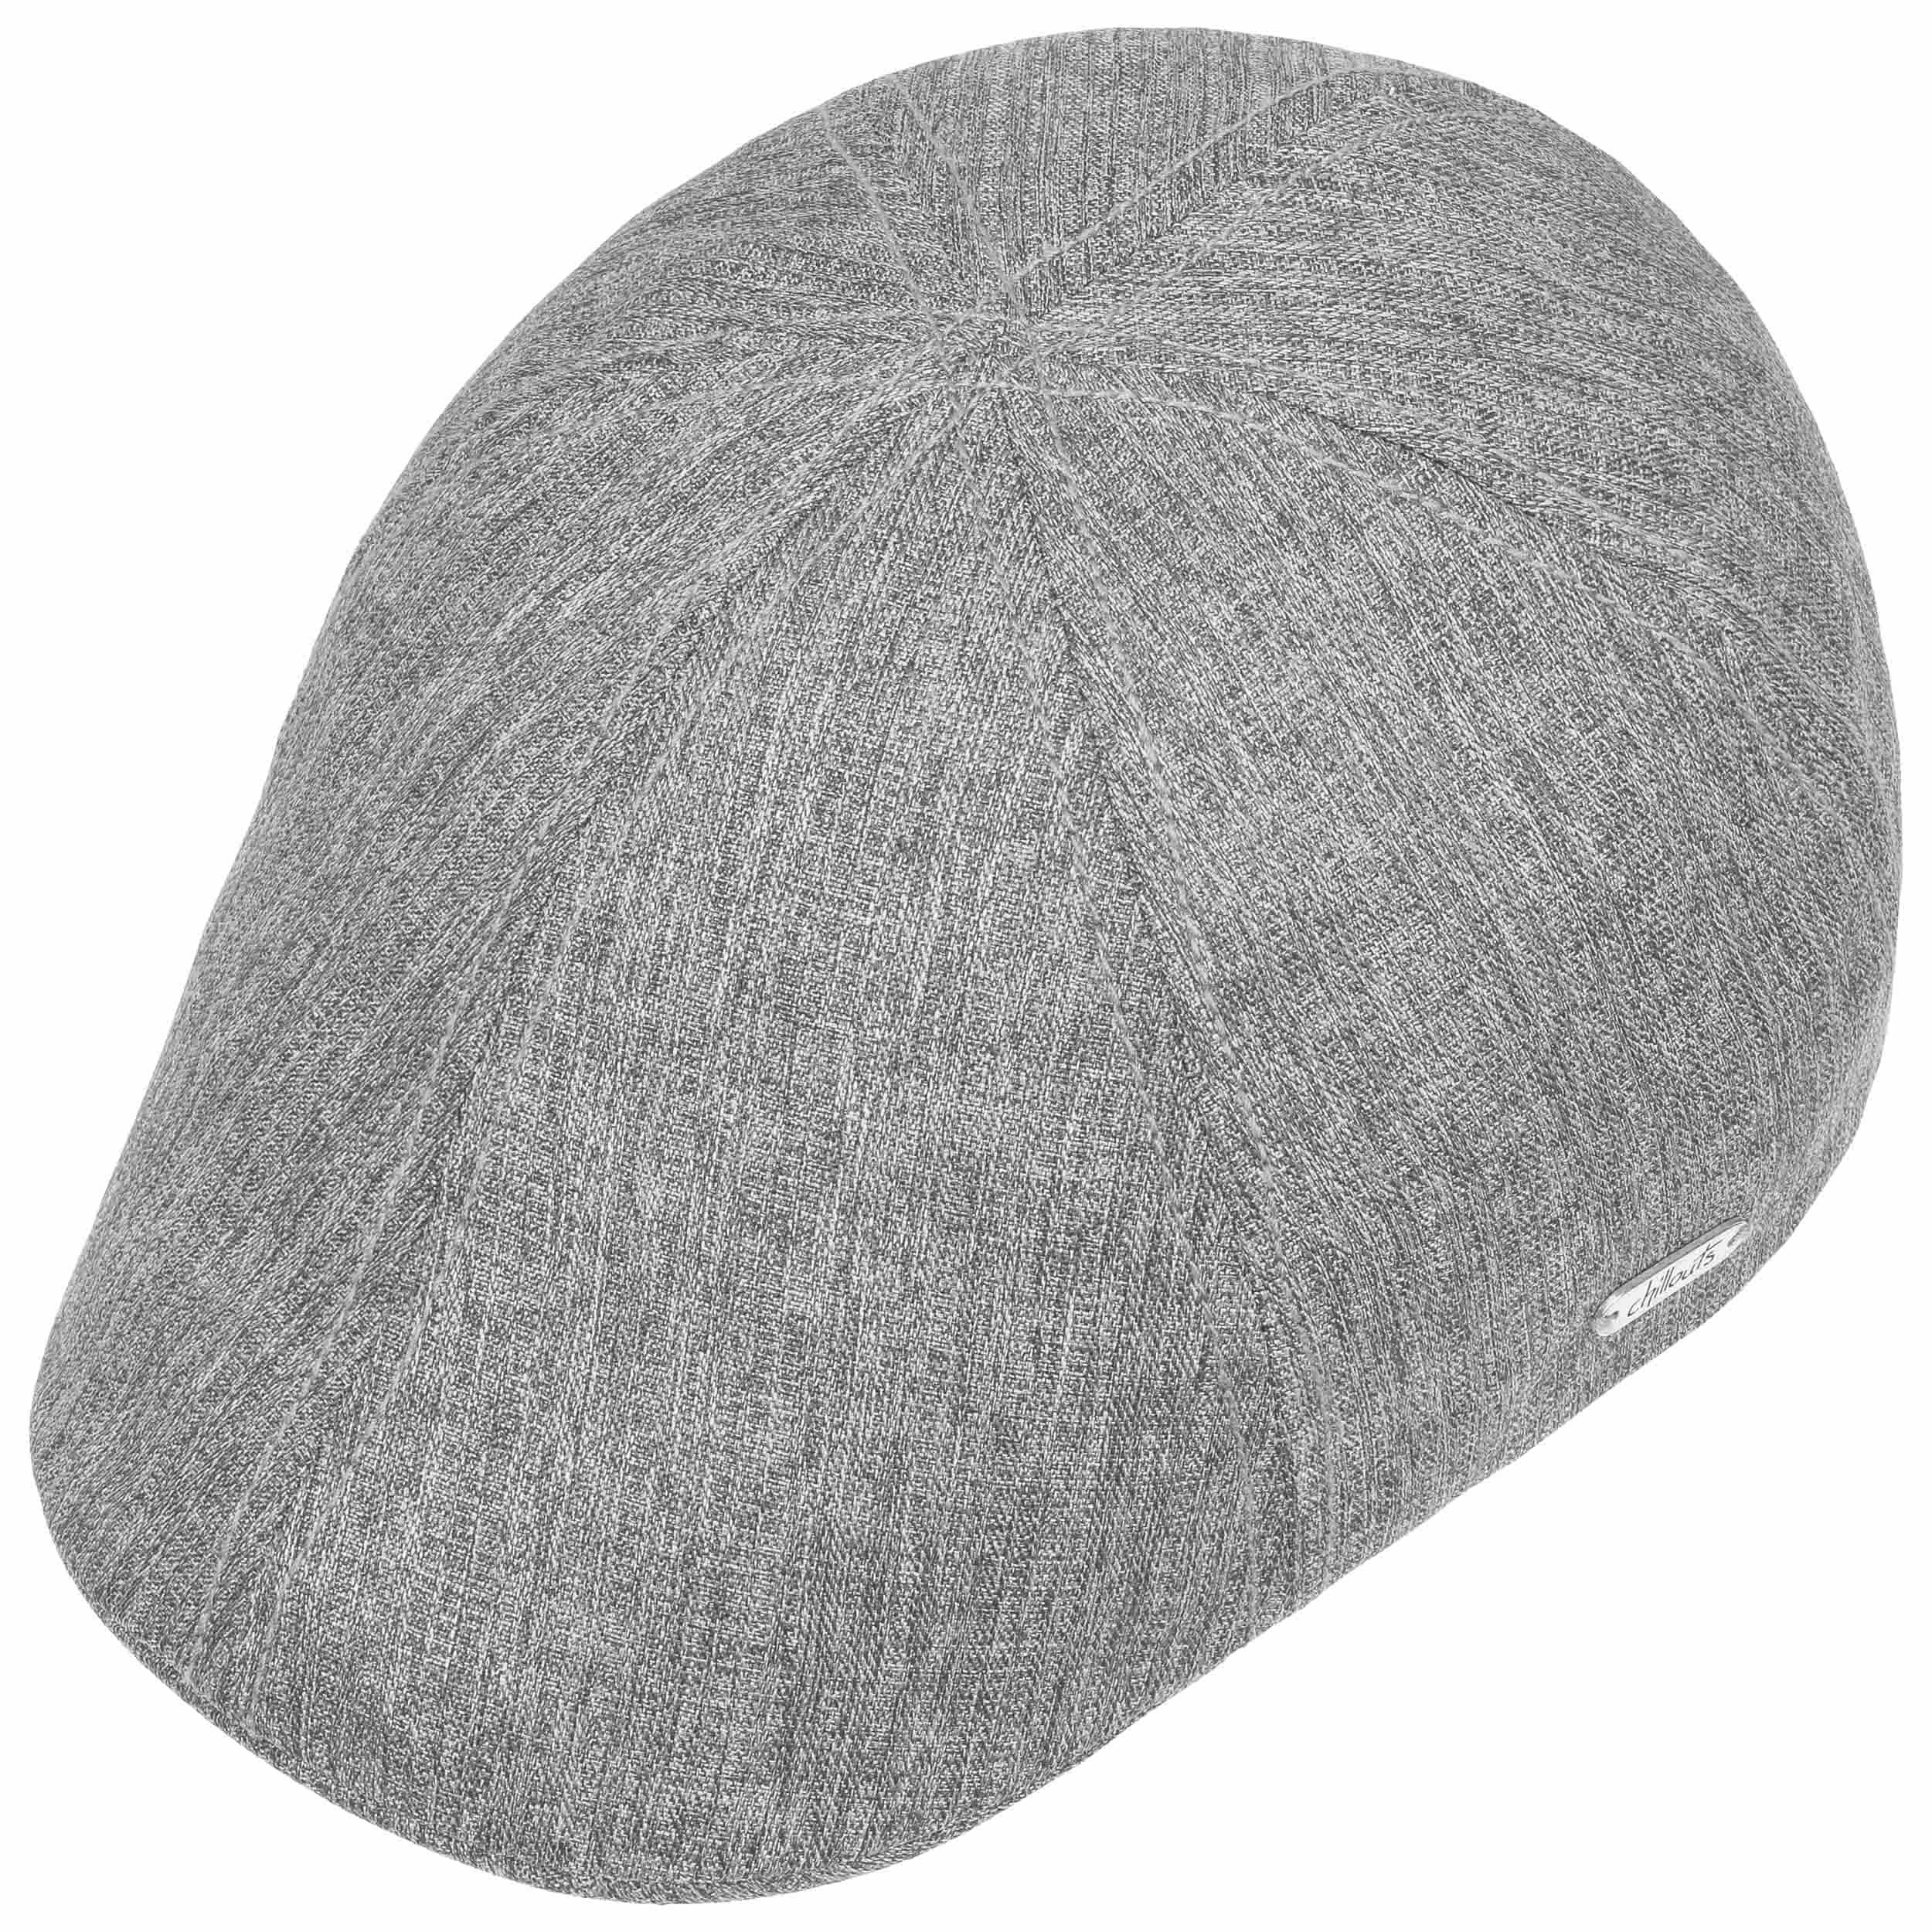 Gorra Birmingham by Chillouts - Gorras - sombreroshop.es 1b66261fff9